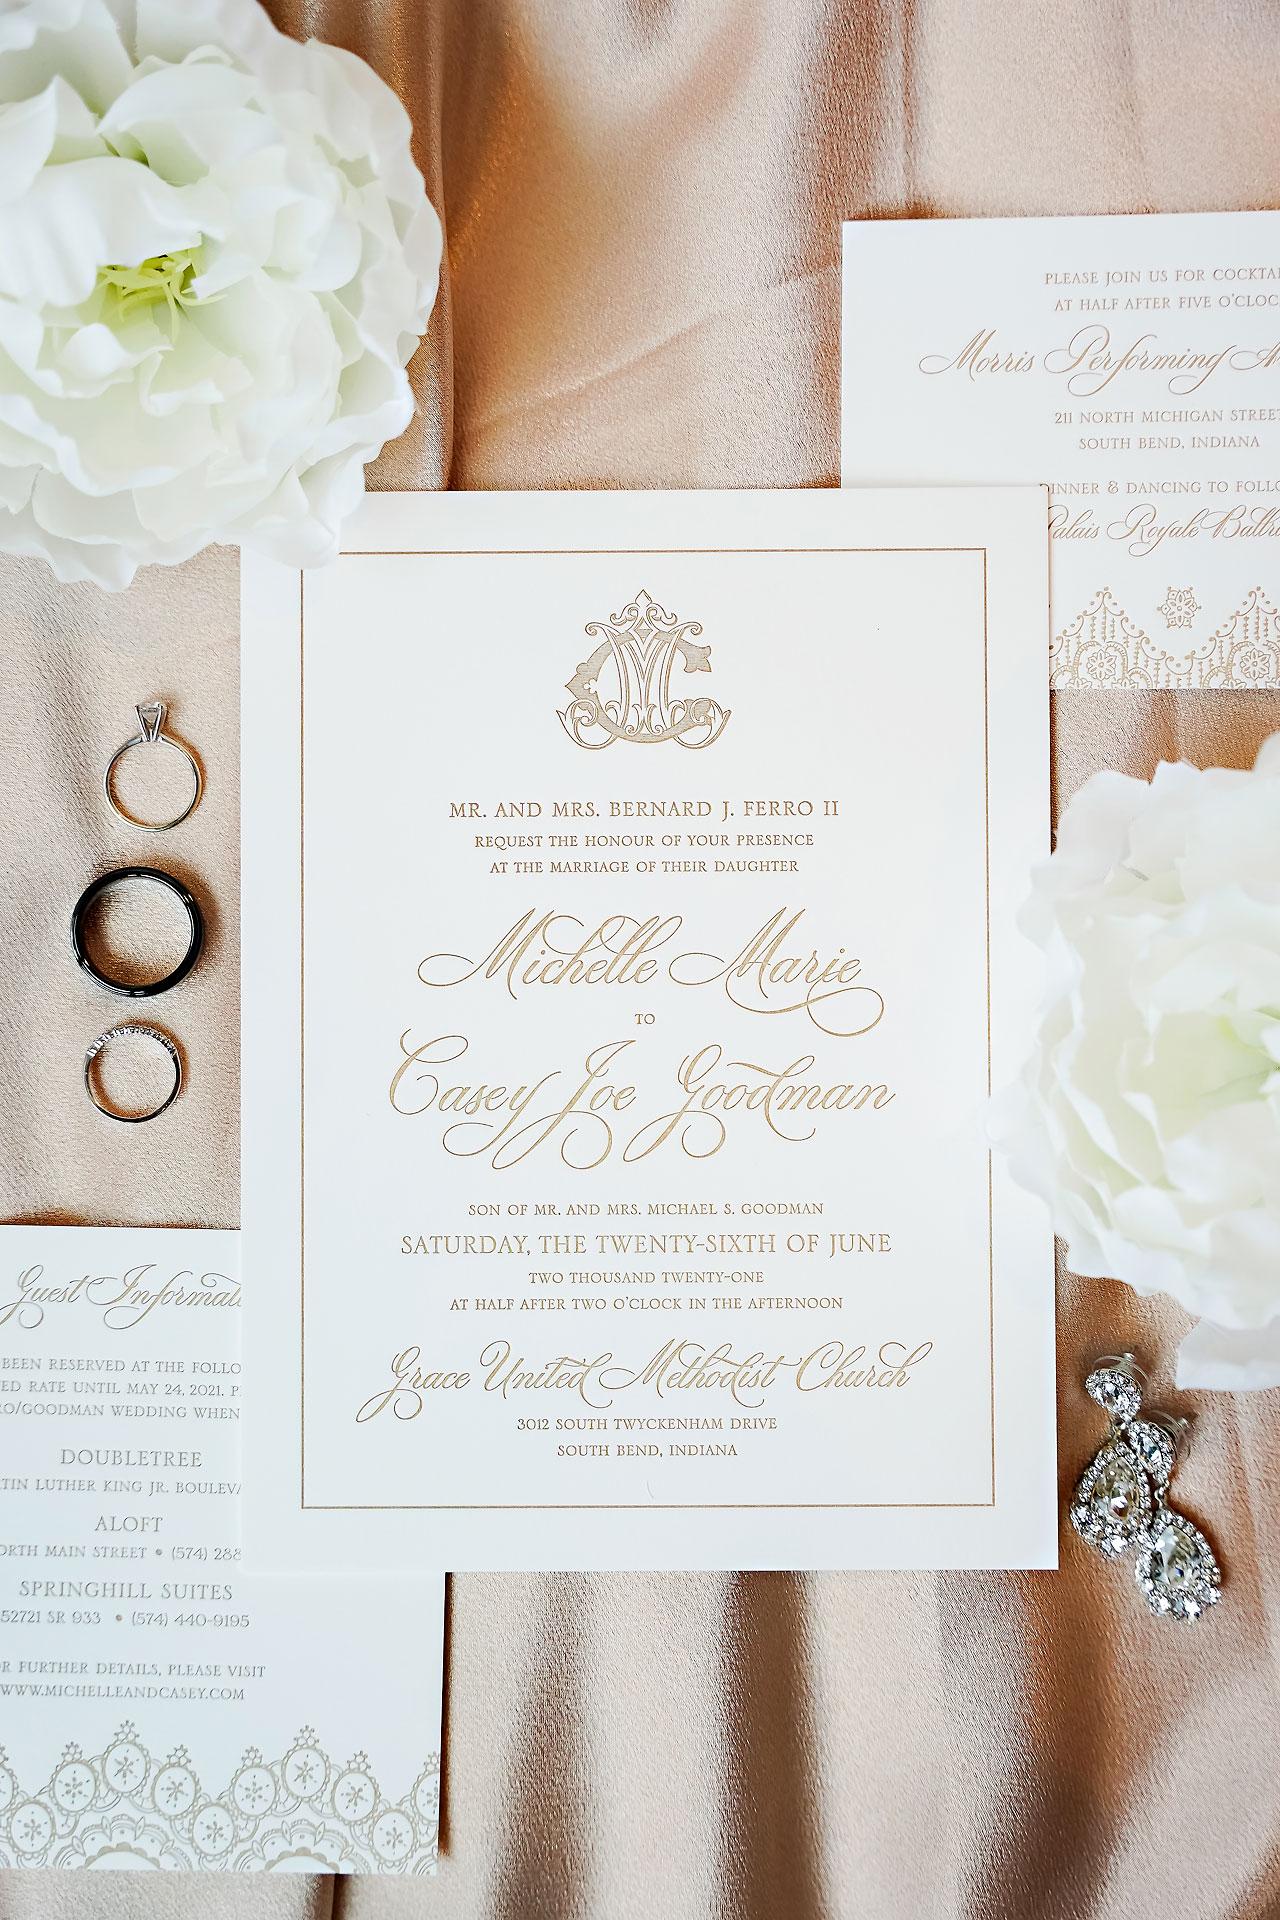 Michelle Casey Palais Royale South Bend Wedding 001